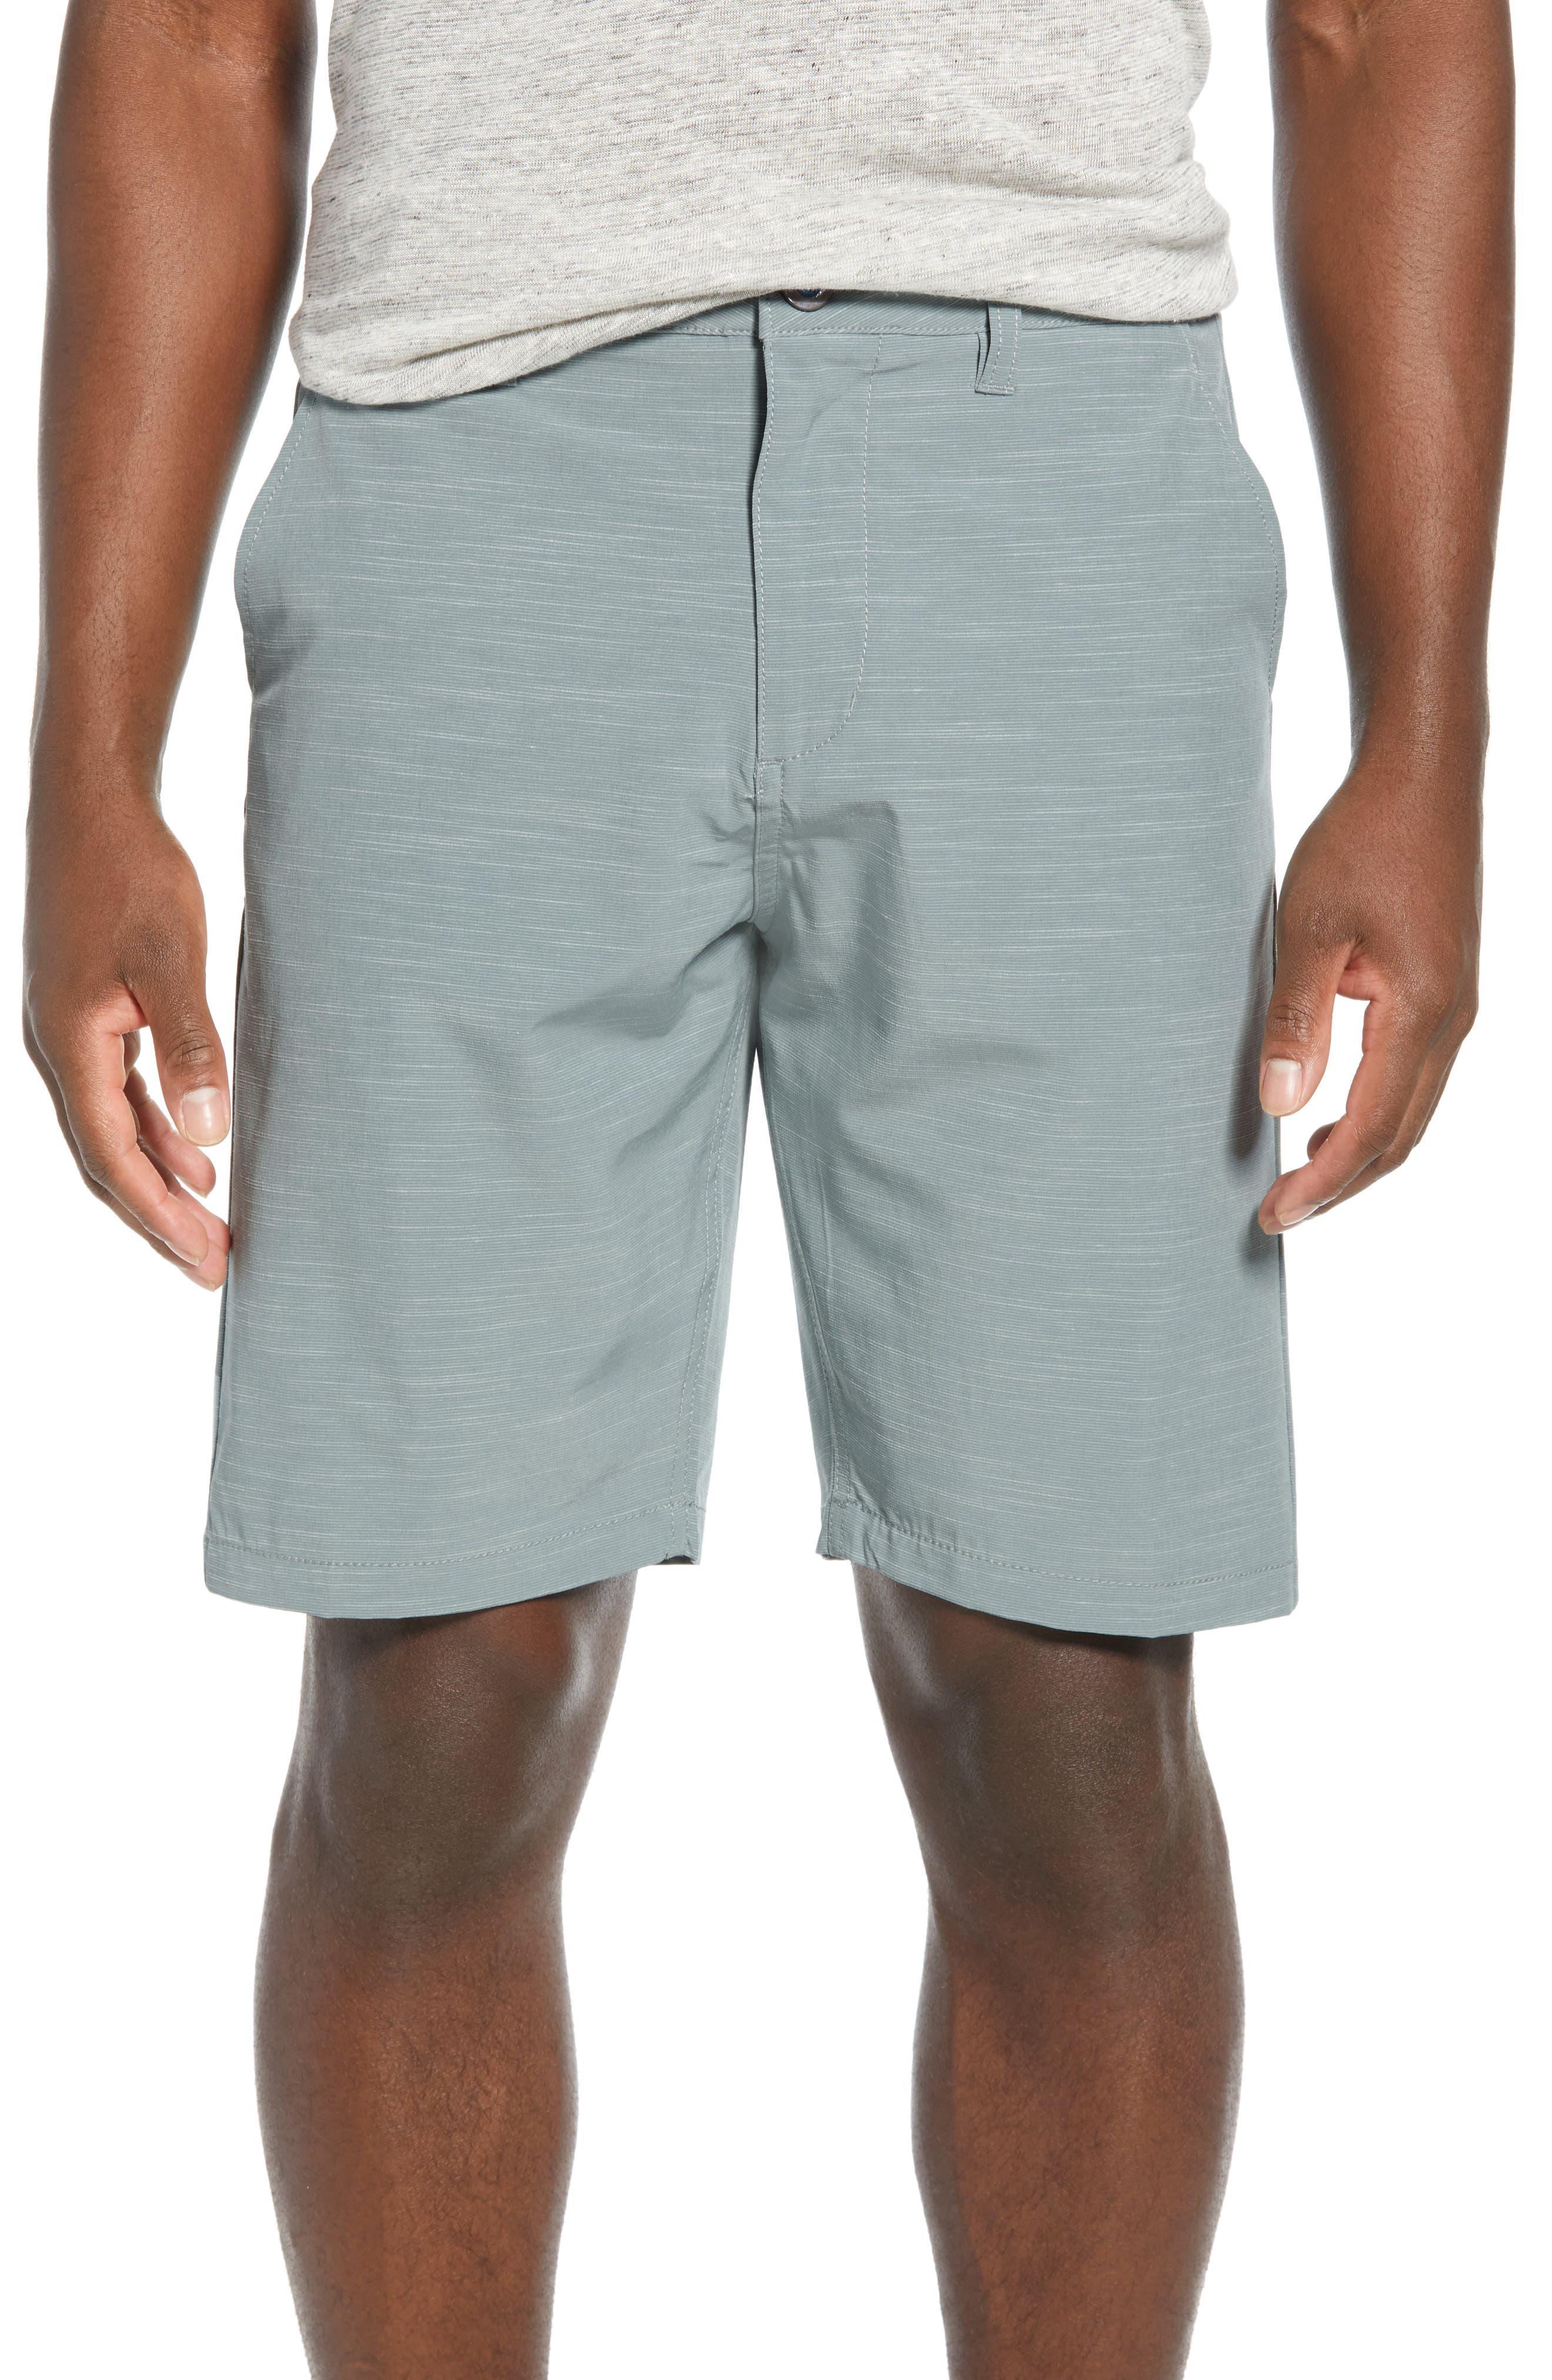 DEVEREUX, Cruiser Hybrid Shorts, Main thumbnail 1, color, SMOKE GREEN